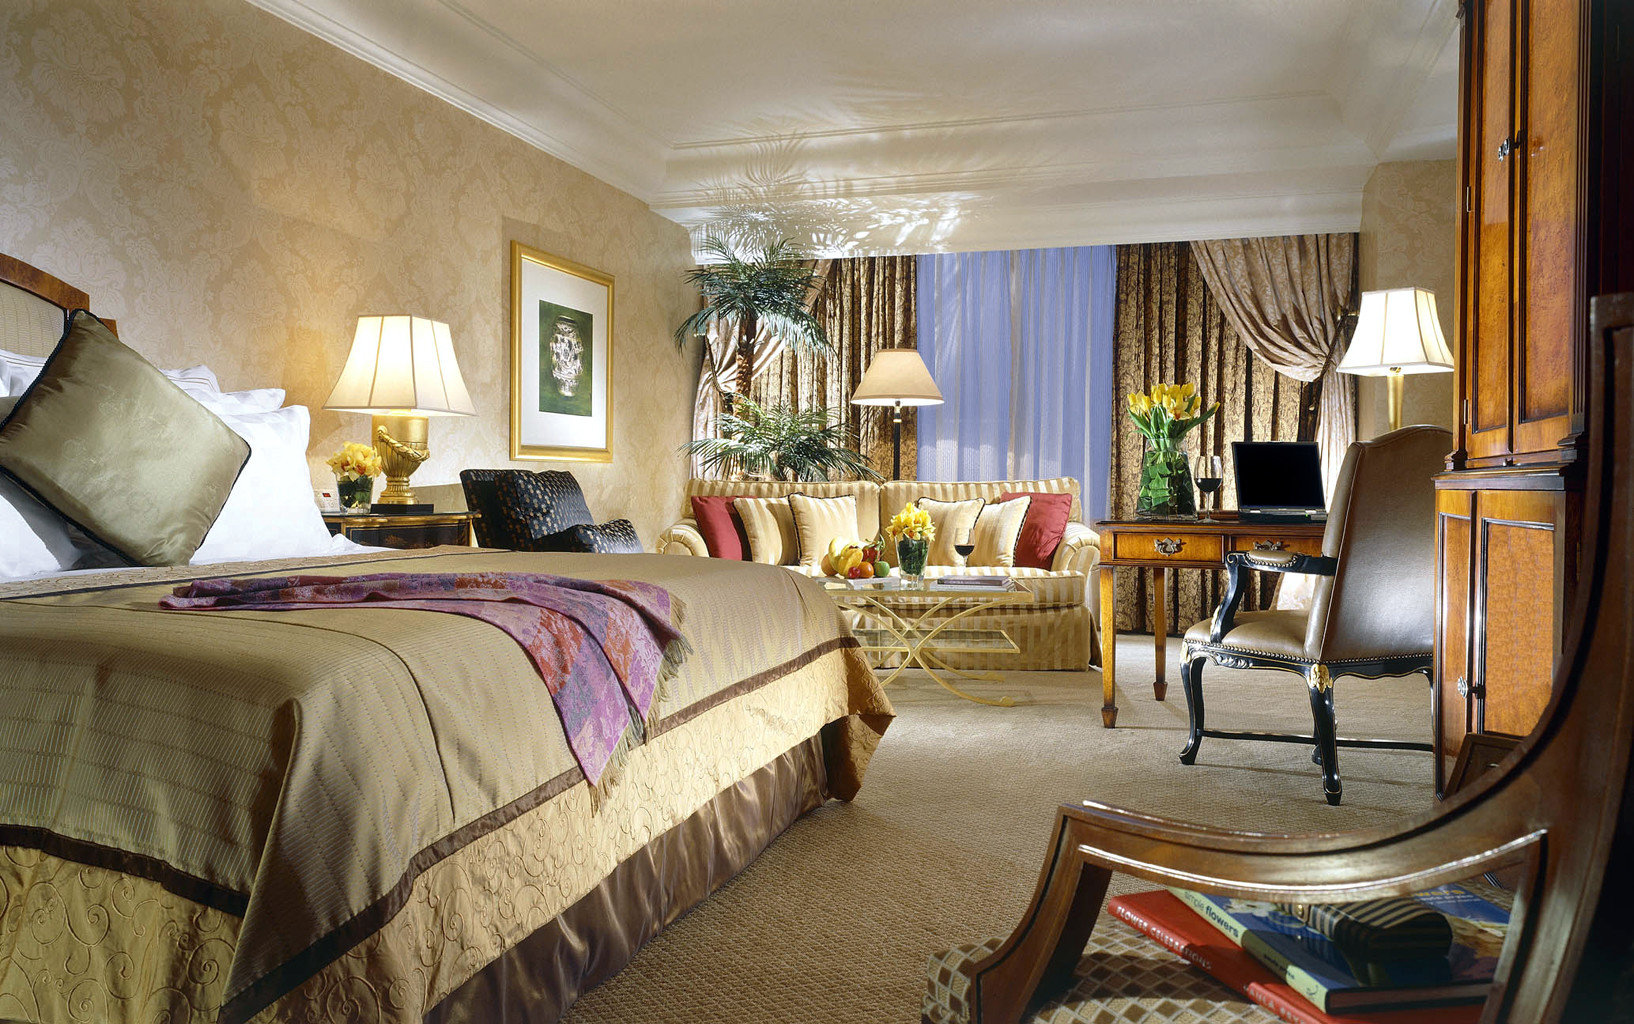 Bedroom Luxury Romance sofa property house home Suite living room cottage Resort Villa mansion farmhouse